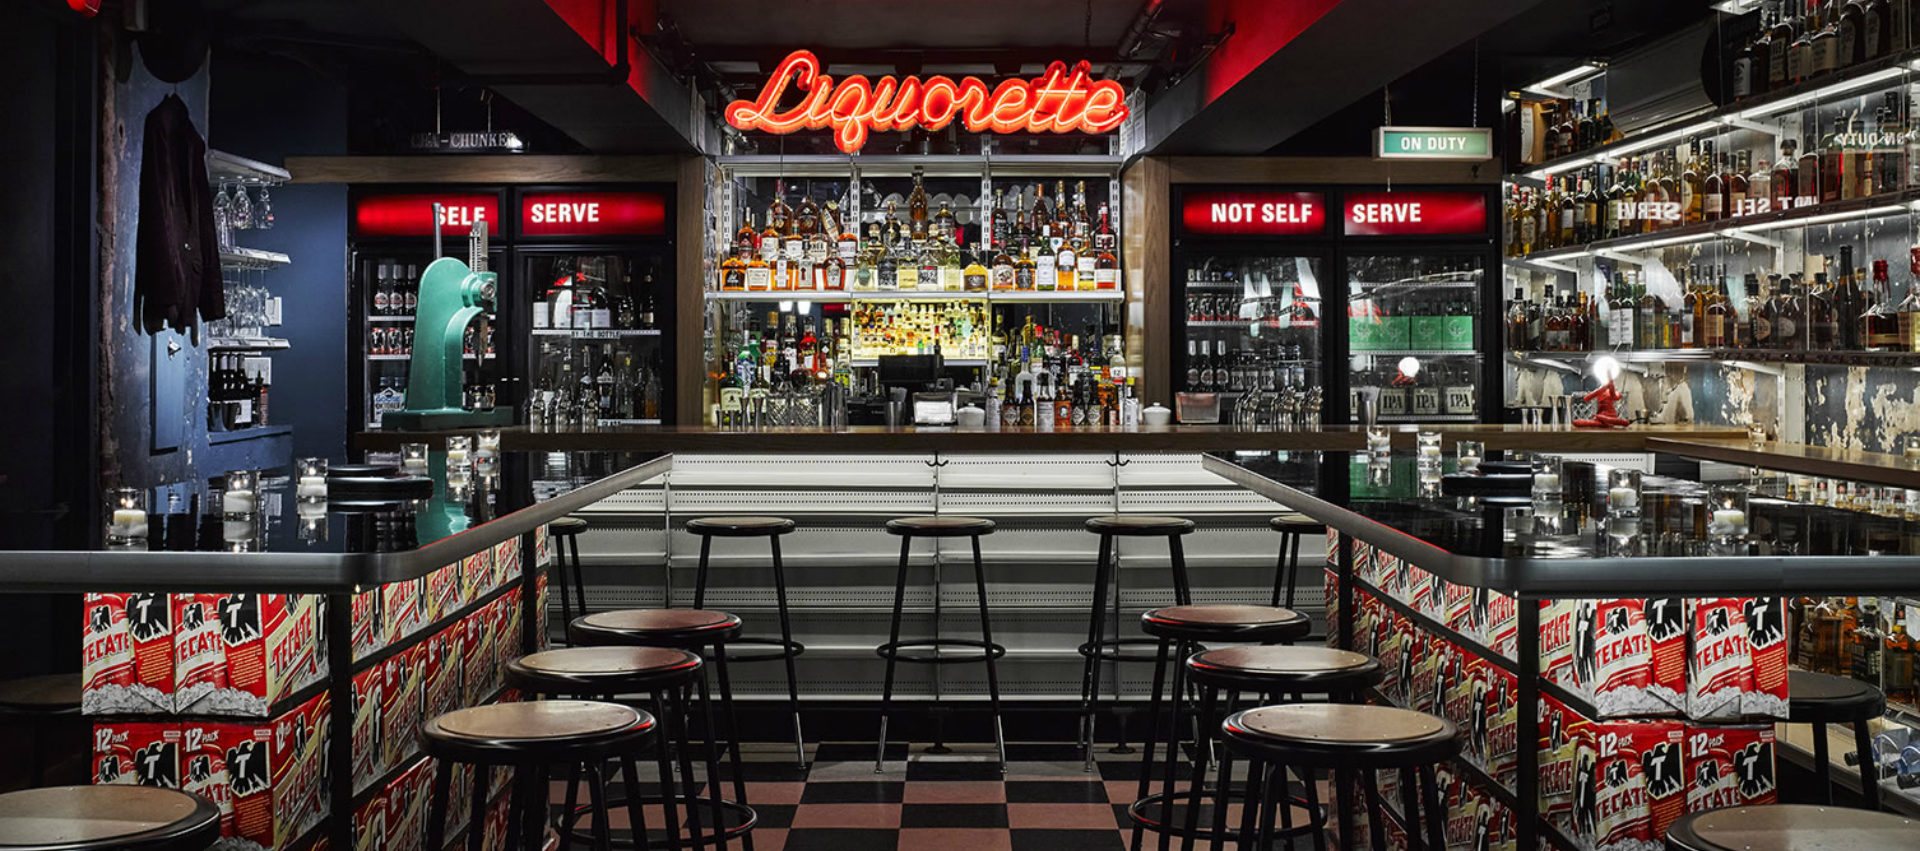 genuine-liquorette-bar-fitzrovia-1920x851.jpg